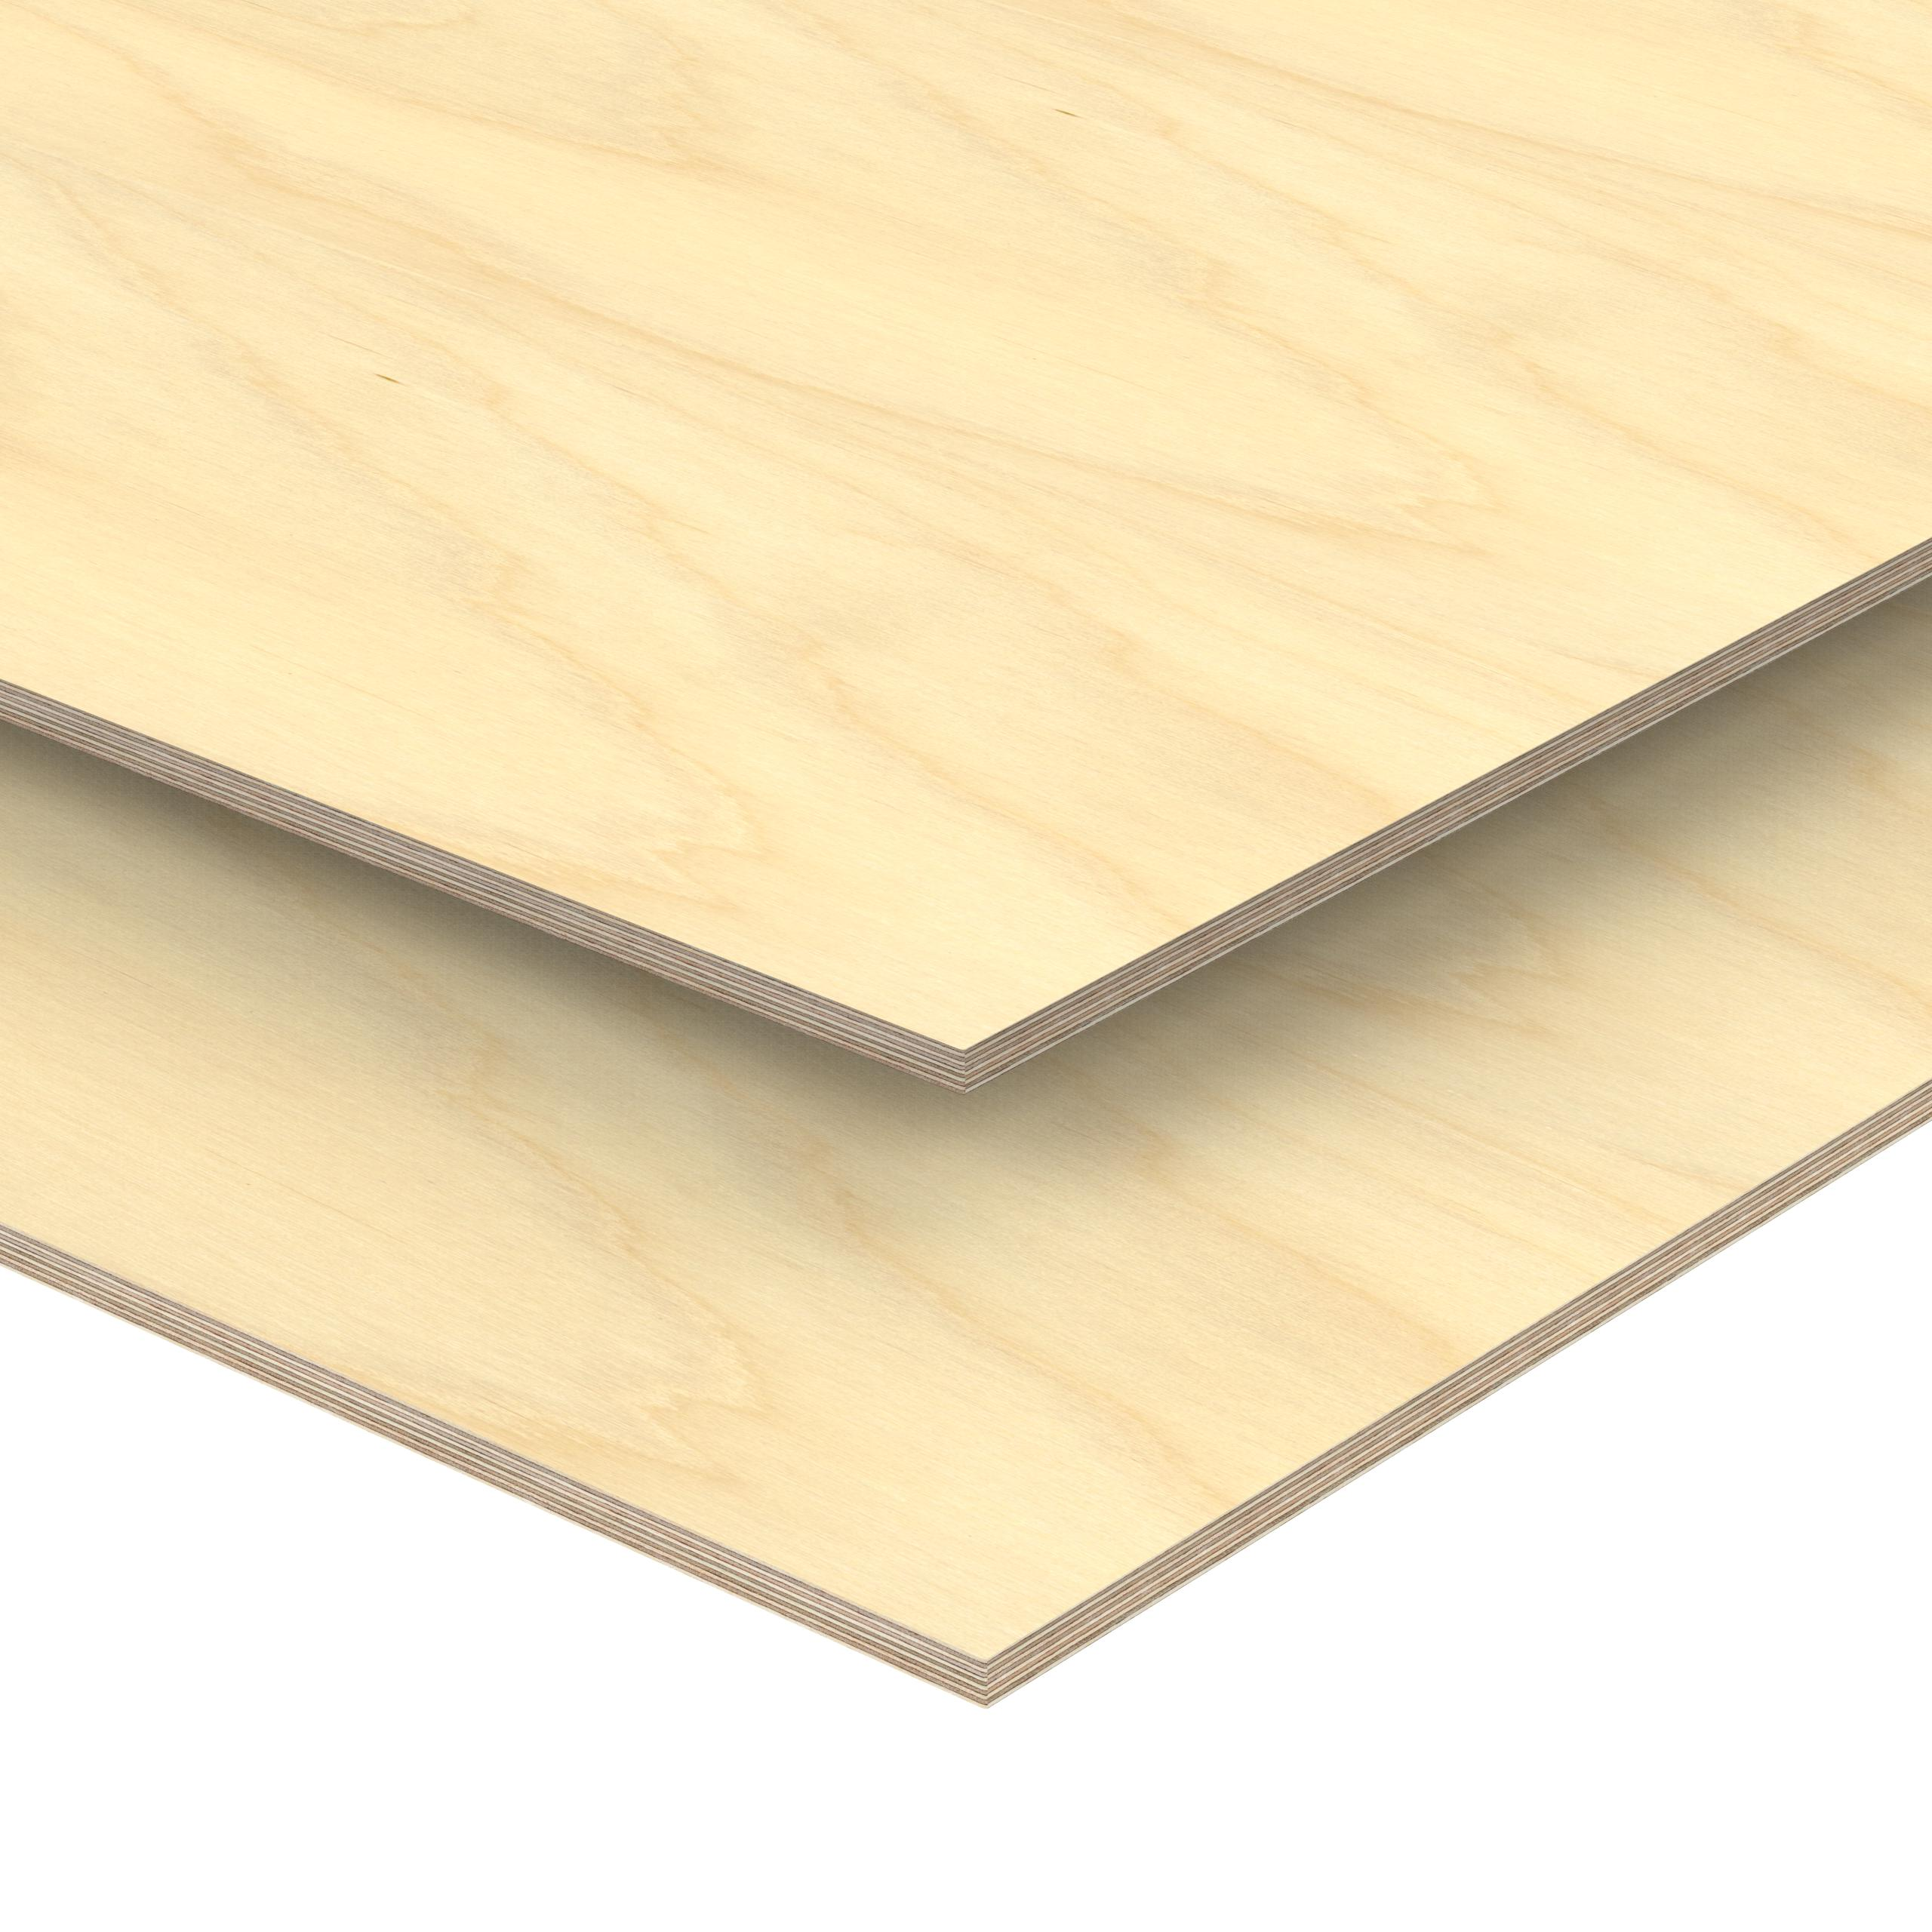 50x130 cm 21mm Multiplex Zuschnitt L/änge bis 200cm Multiplexplatten Zuschnitte Auswahl